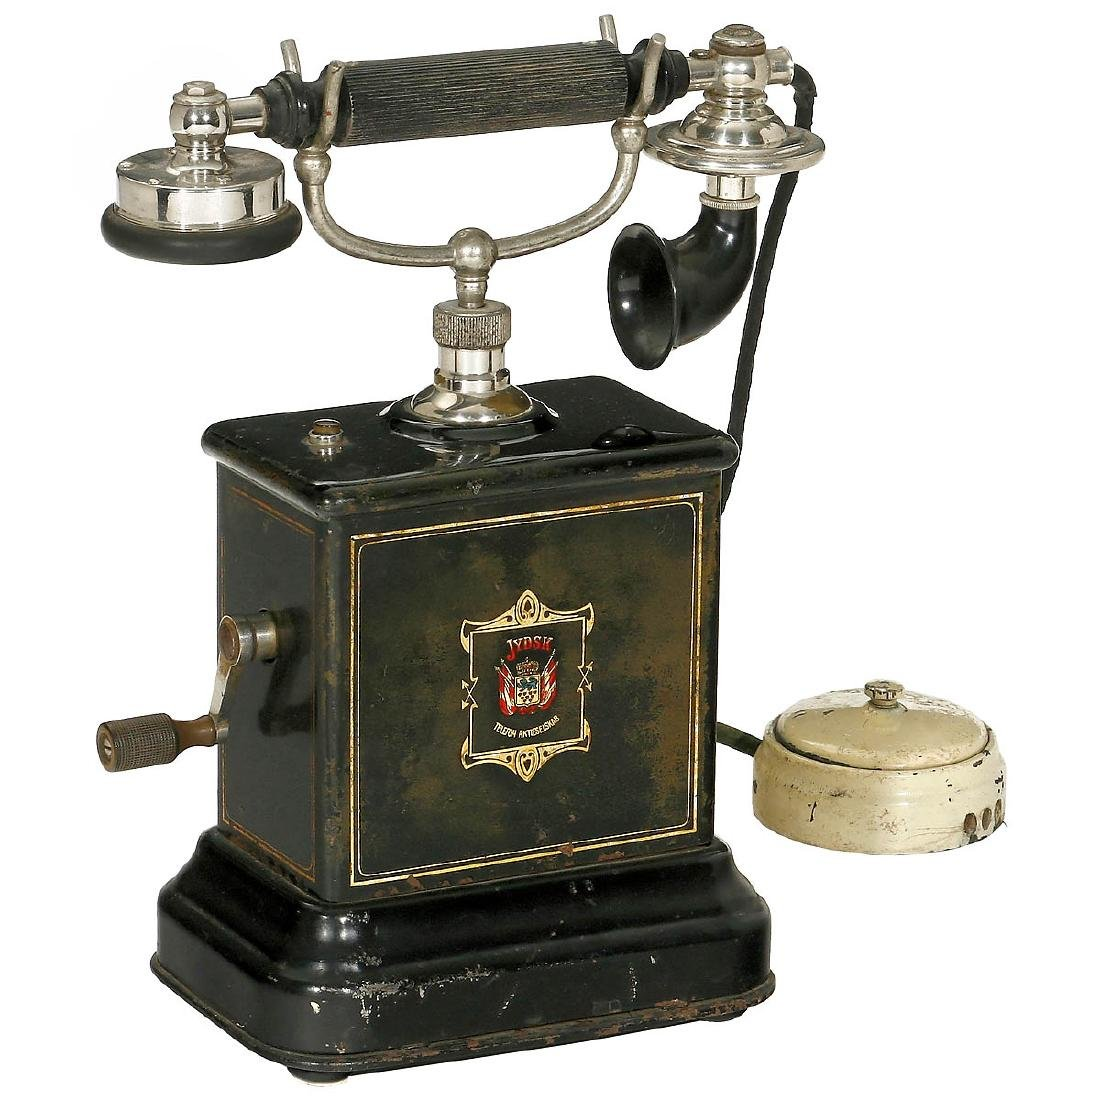 L.M. Ericsson Jydsk Desk Telephone, c. 1915